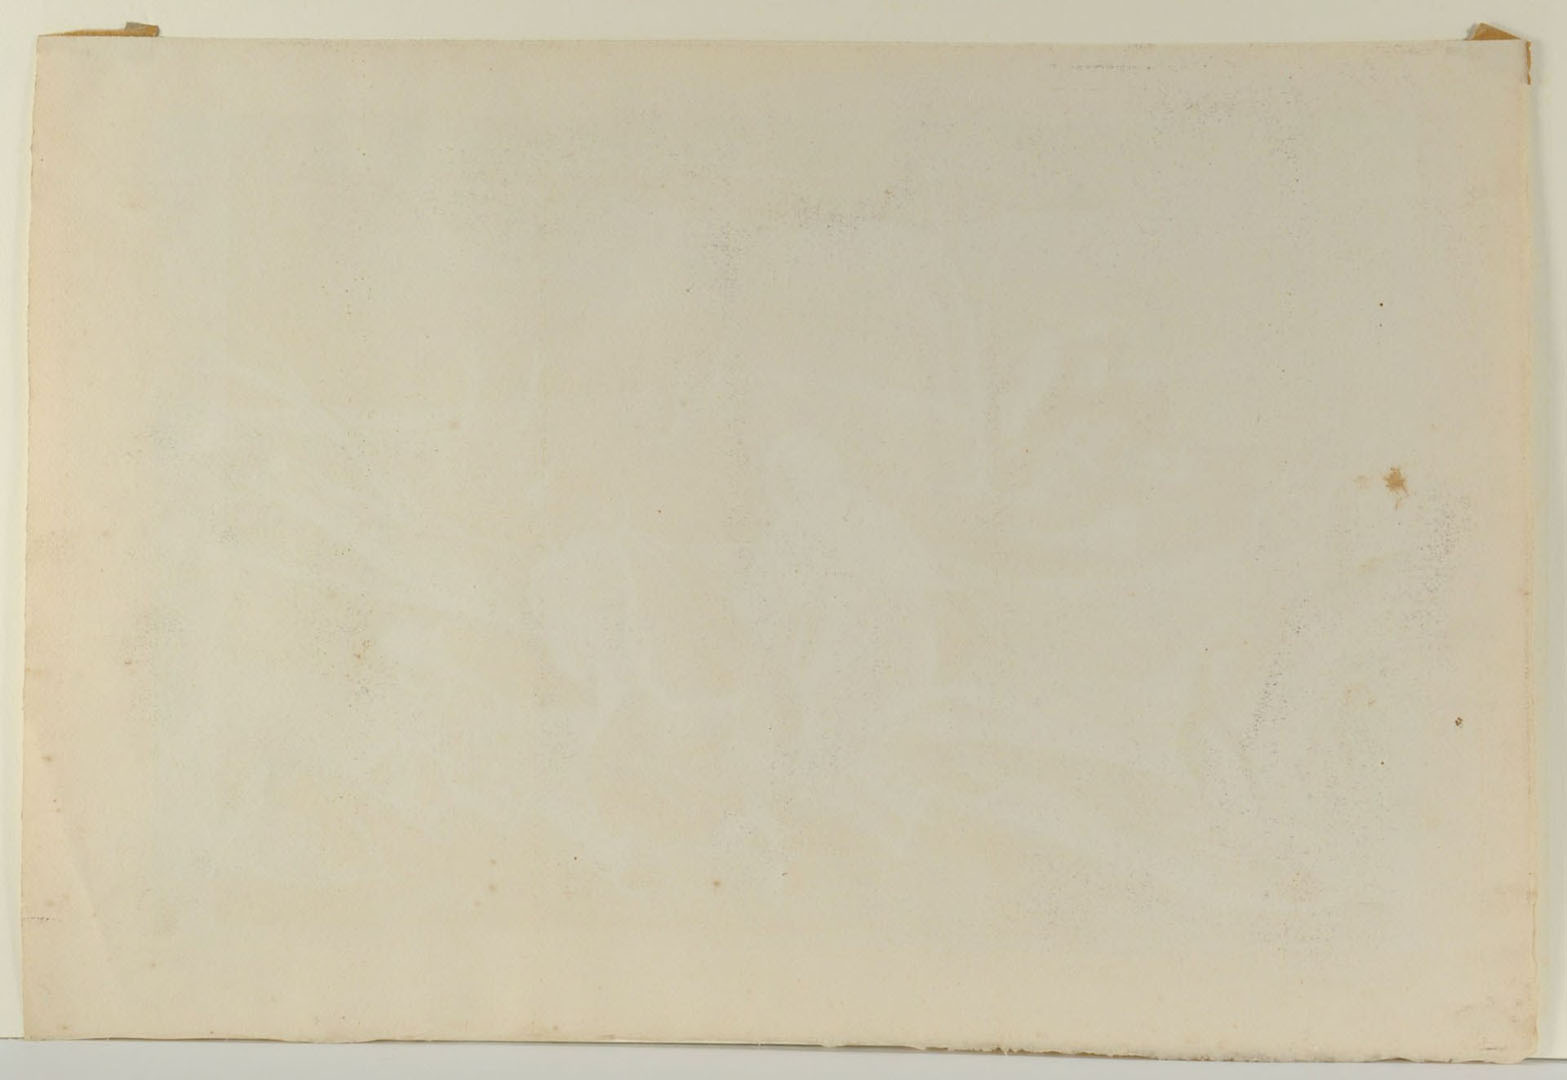 Lot 2872271: 3 Prints, Perez, Albro & Gropper